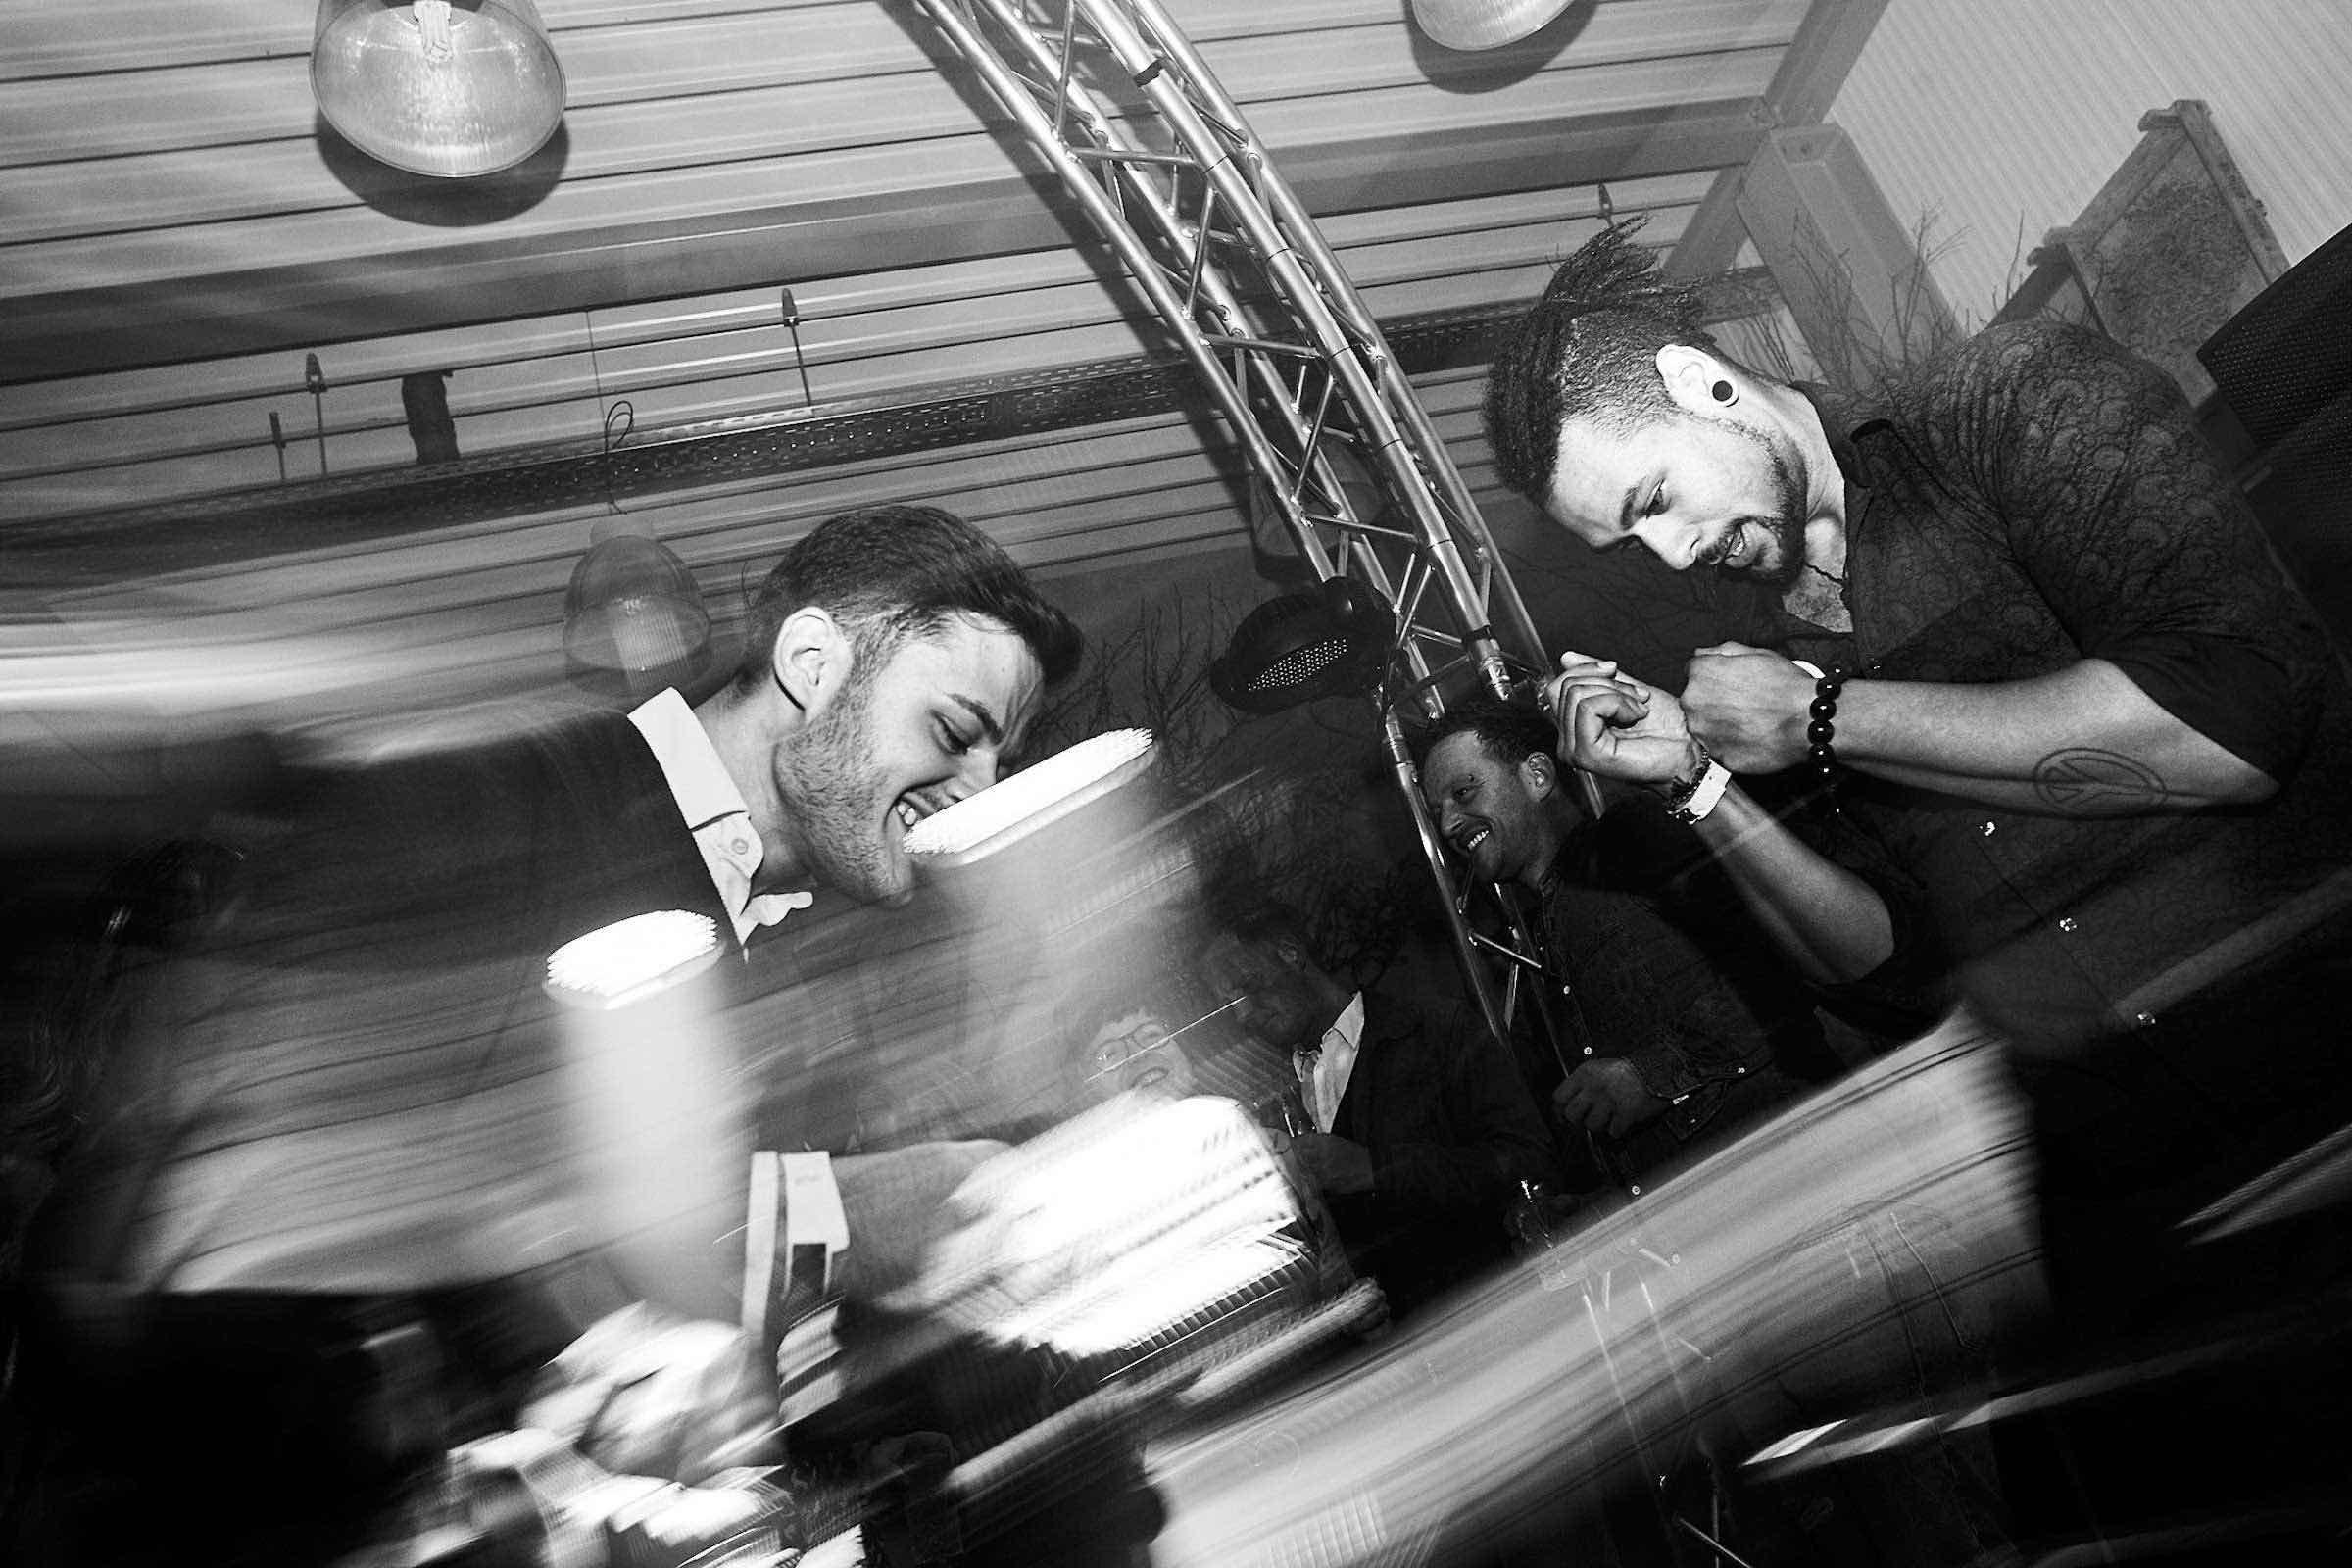 DJ | Mieten | Hamburg | DJ | Agentur | DJ | Service | DJ | Messe | DJ | Firmenevent | Firmenfeier | Hamburg | DJ | Betriebsfeier | Hamburg | Tanzfläche | DJ | Hochzeit | Buchen | Anfragen | Hamburgfeiert